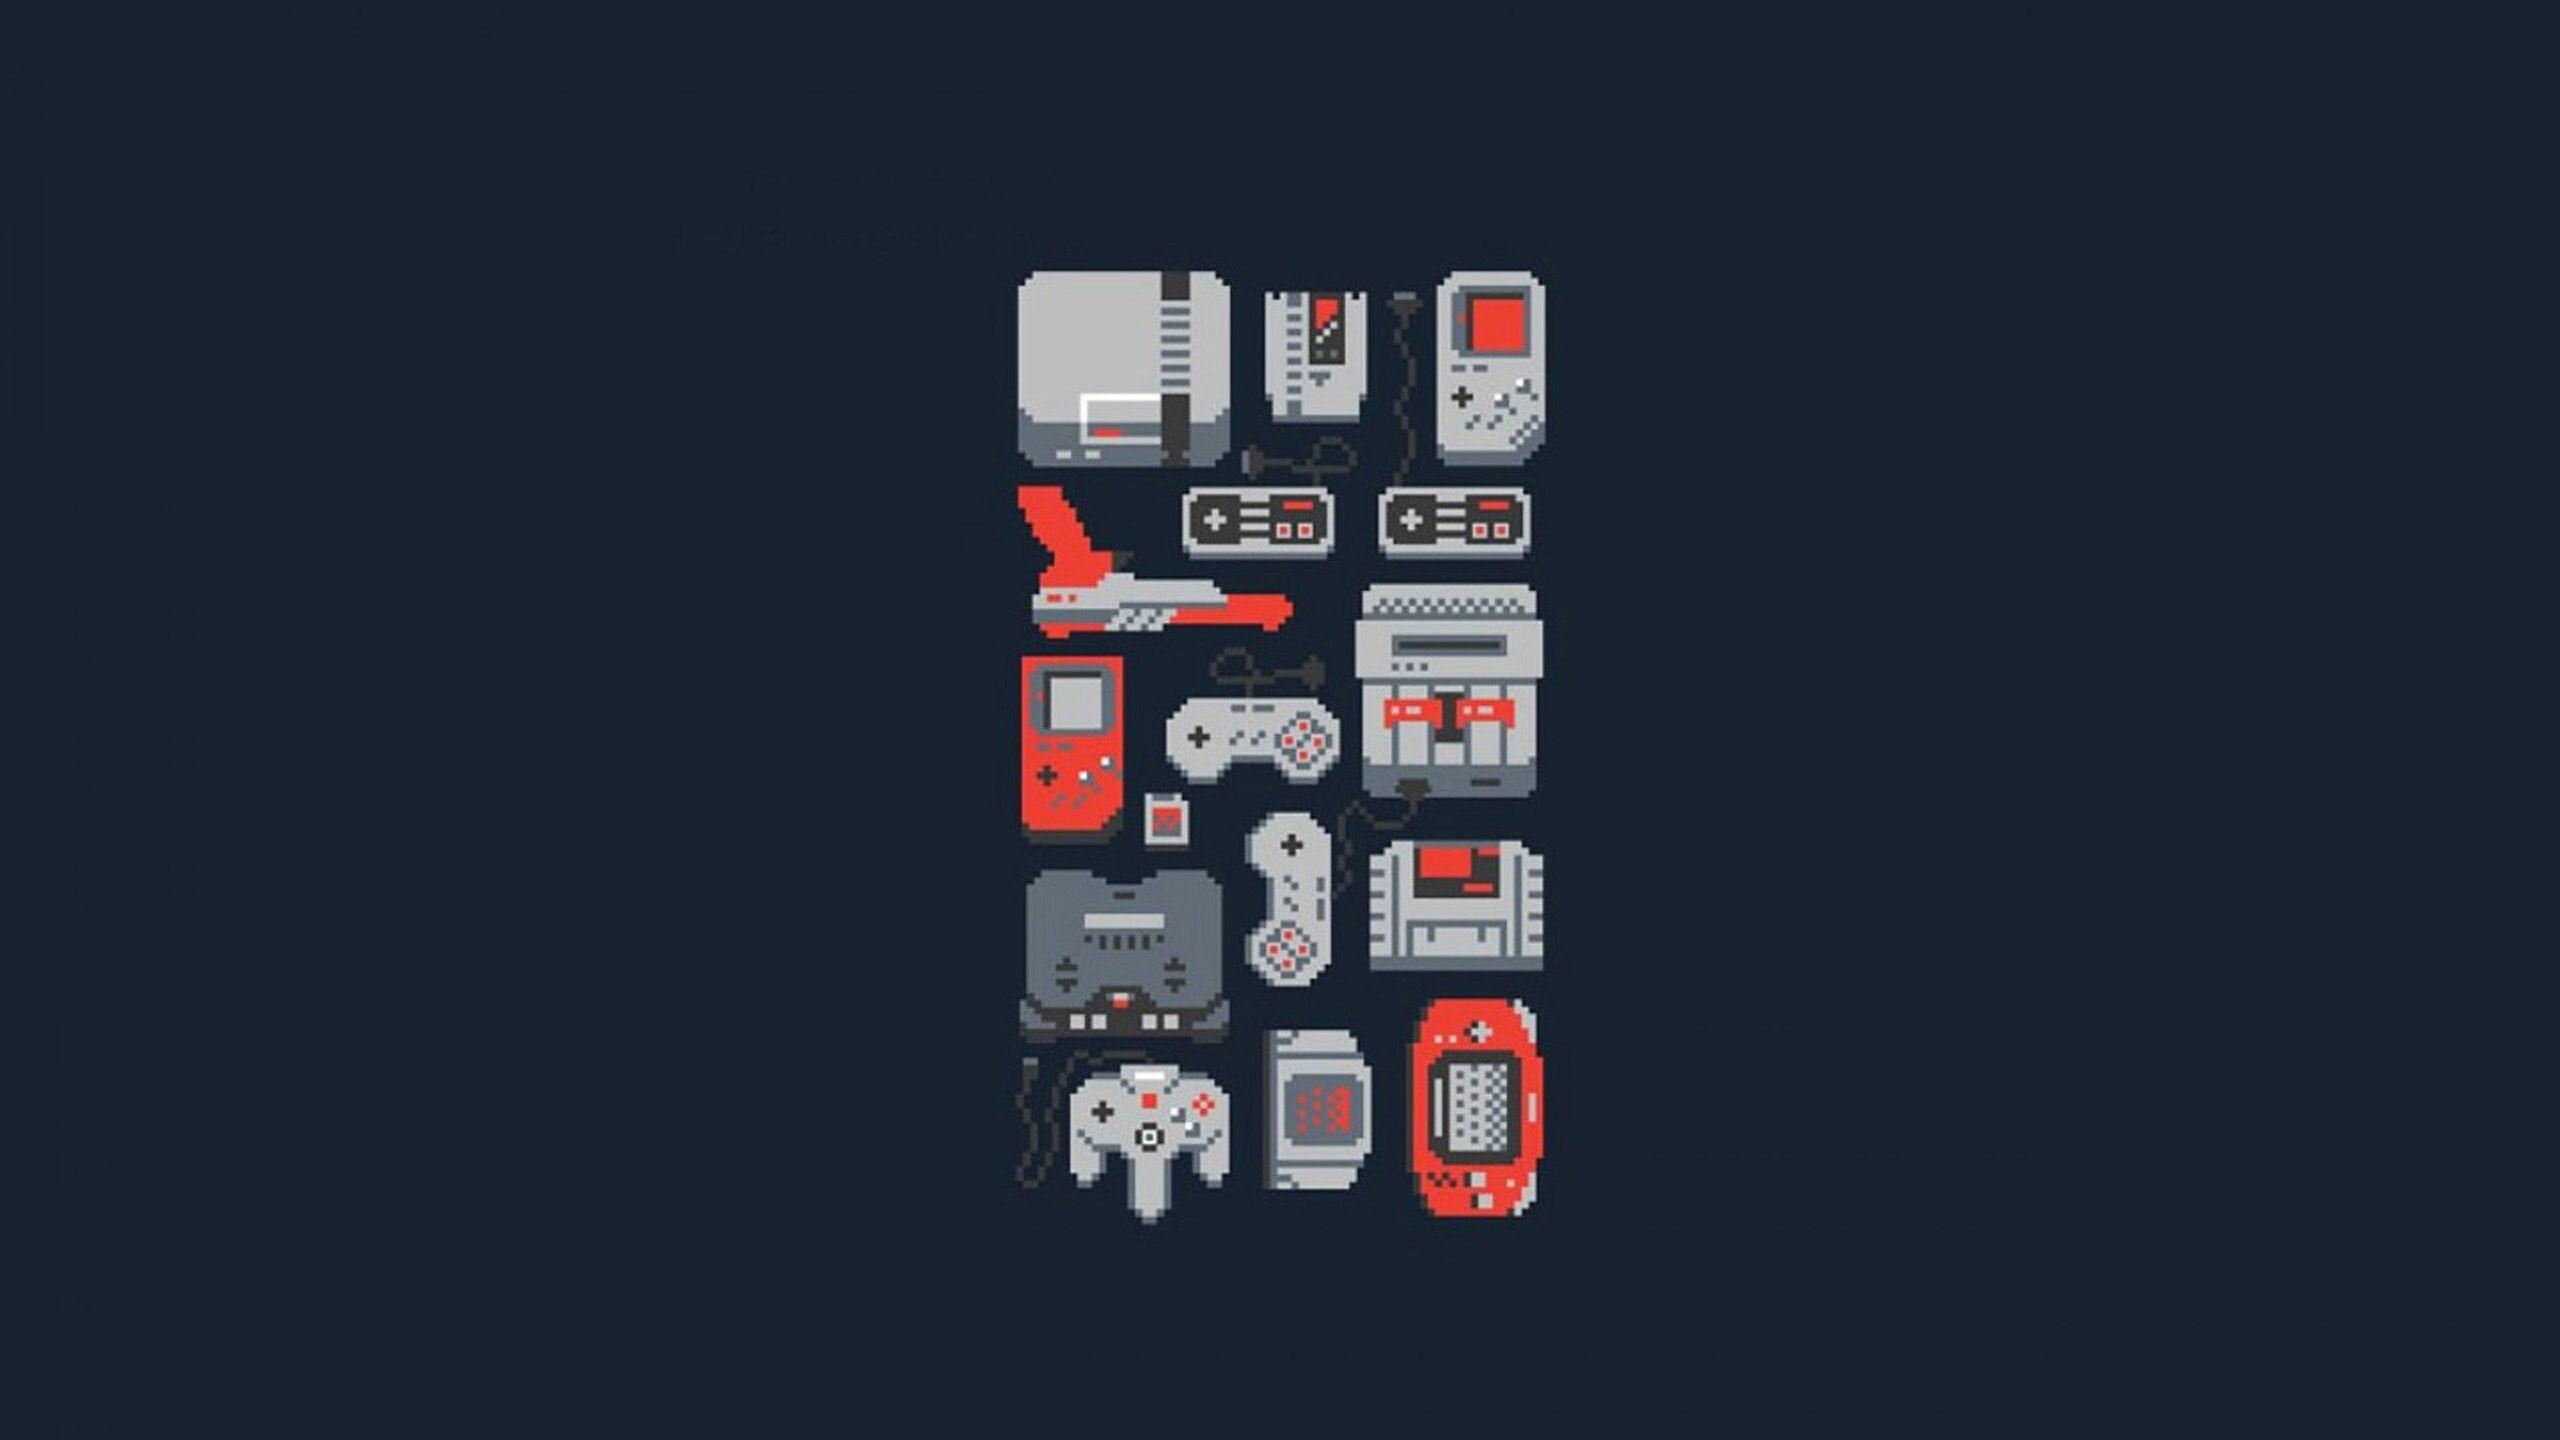 50+ Retro Game Wallpapers: HD, 4K, 5K